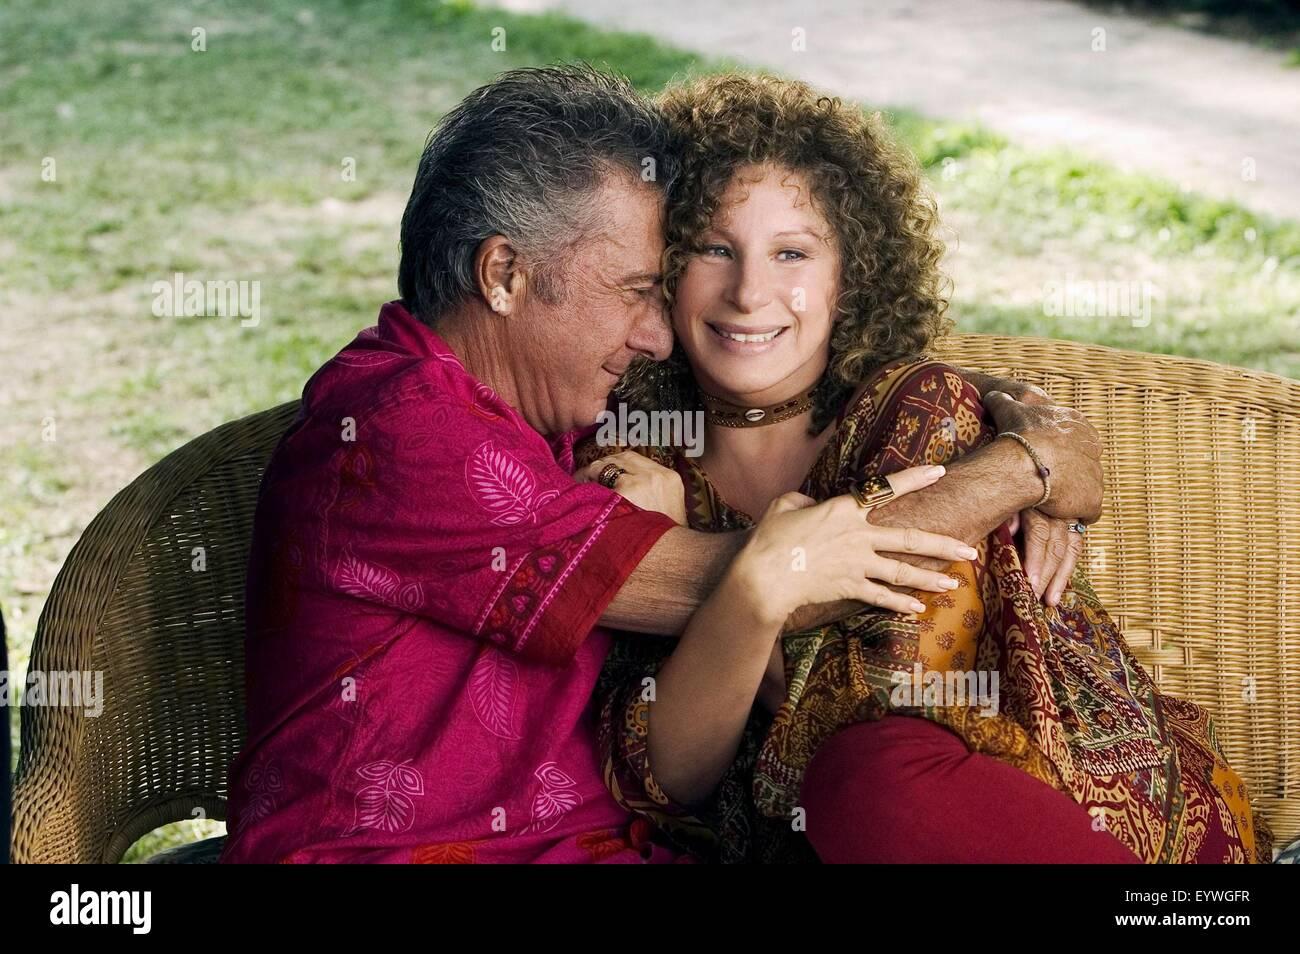 Meet the Fockers ; Year : 2004 USA ; Director : Jay Roach ; Dustin Hoffman, Barbra Streisand, ; Photo: Tracy Bennett - Stock Image